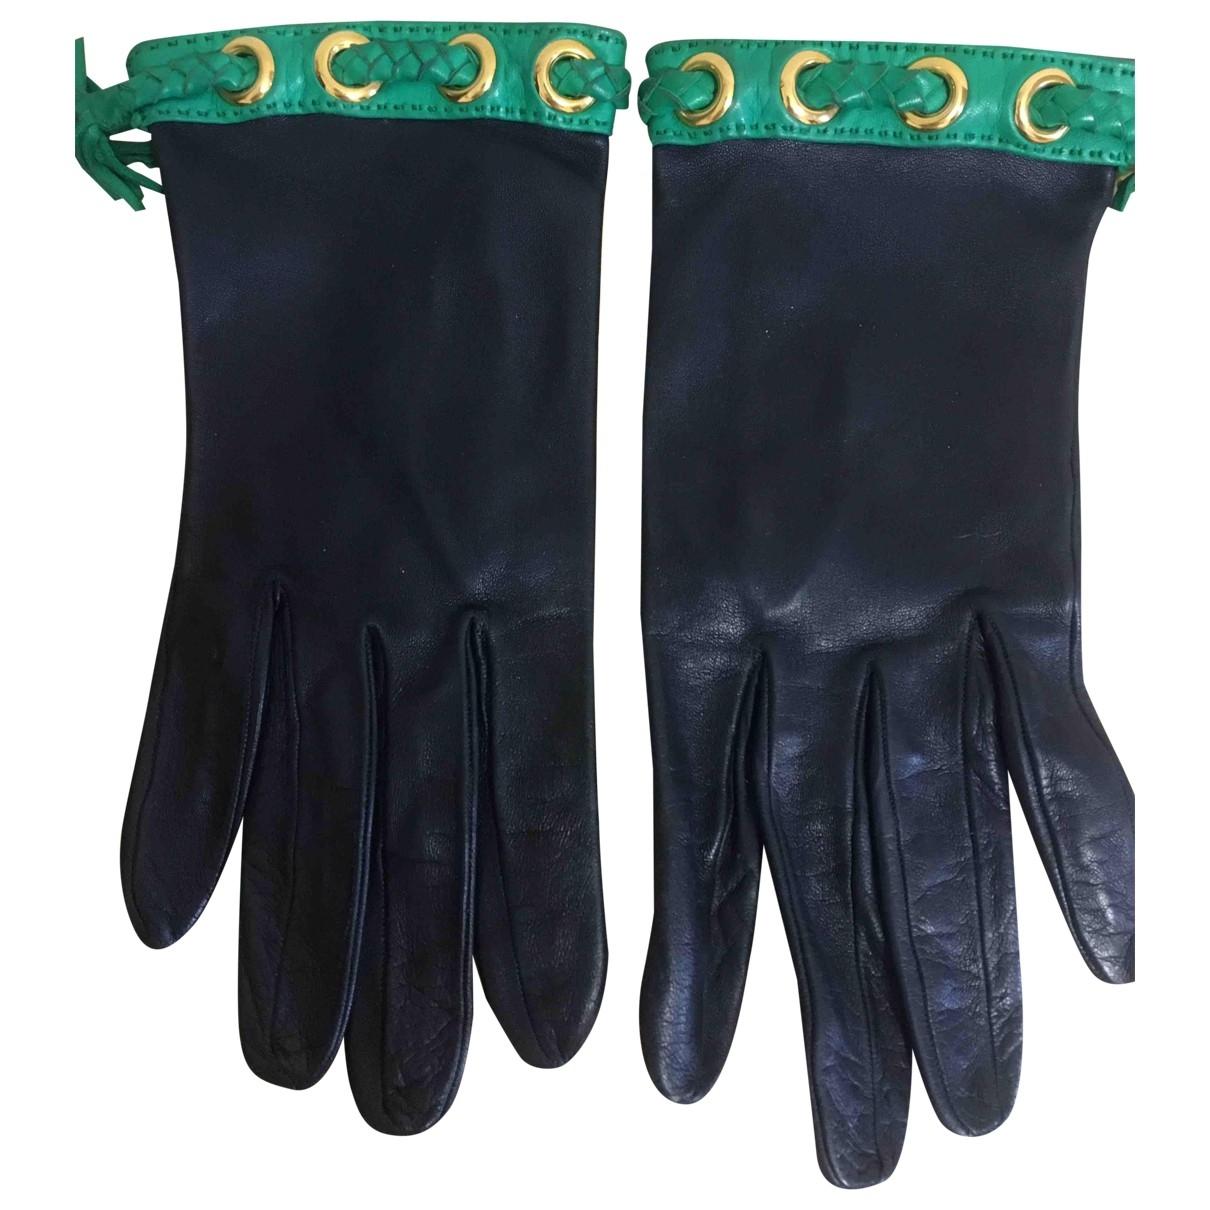 Hermès \N Blue Leather Gloves for Women M International